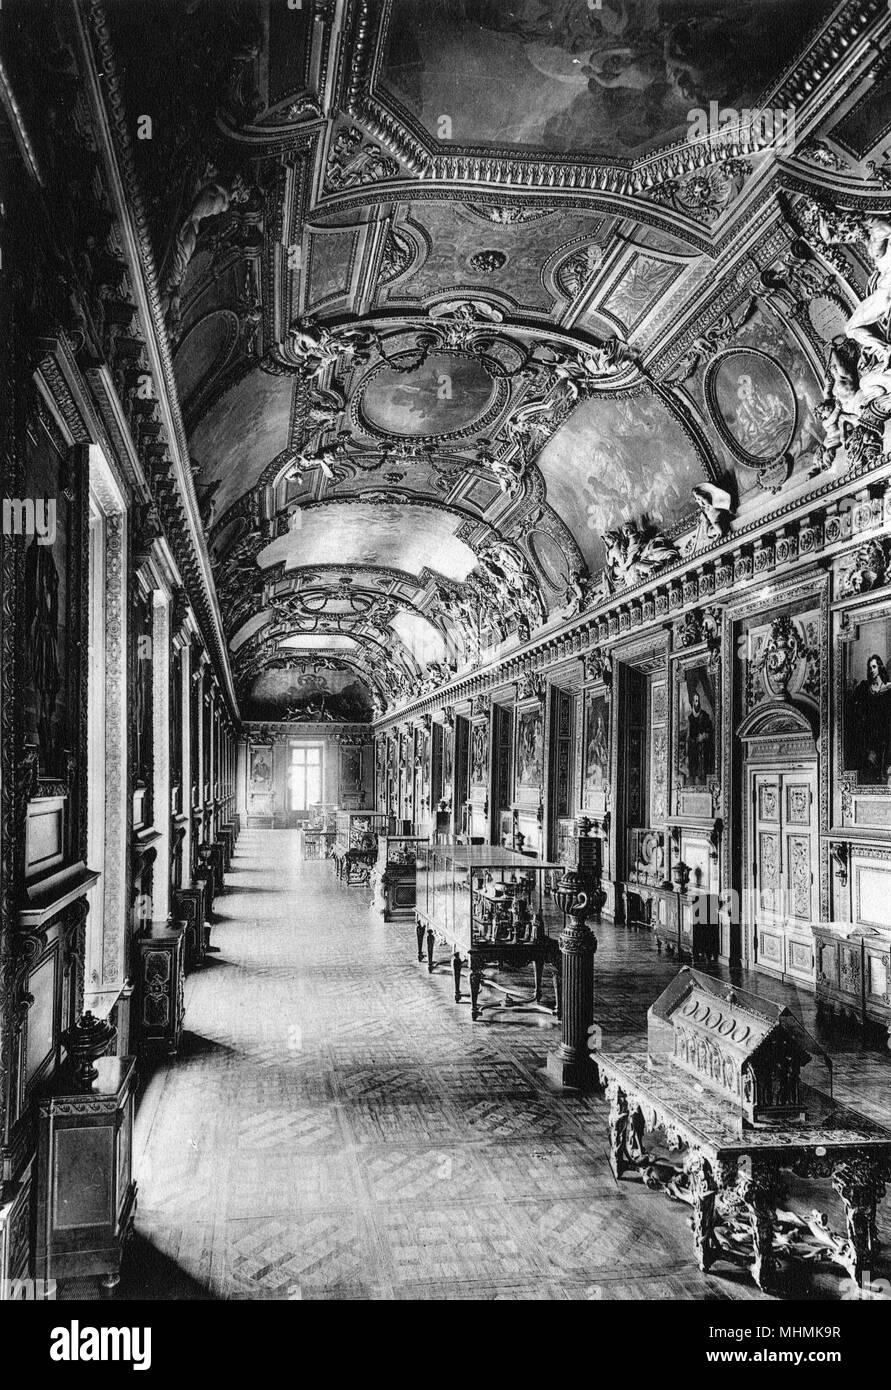 Le Louvre: interior view, Galerie d'Apollon      Date: circa 1900 - Stock Image